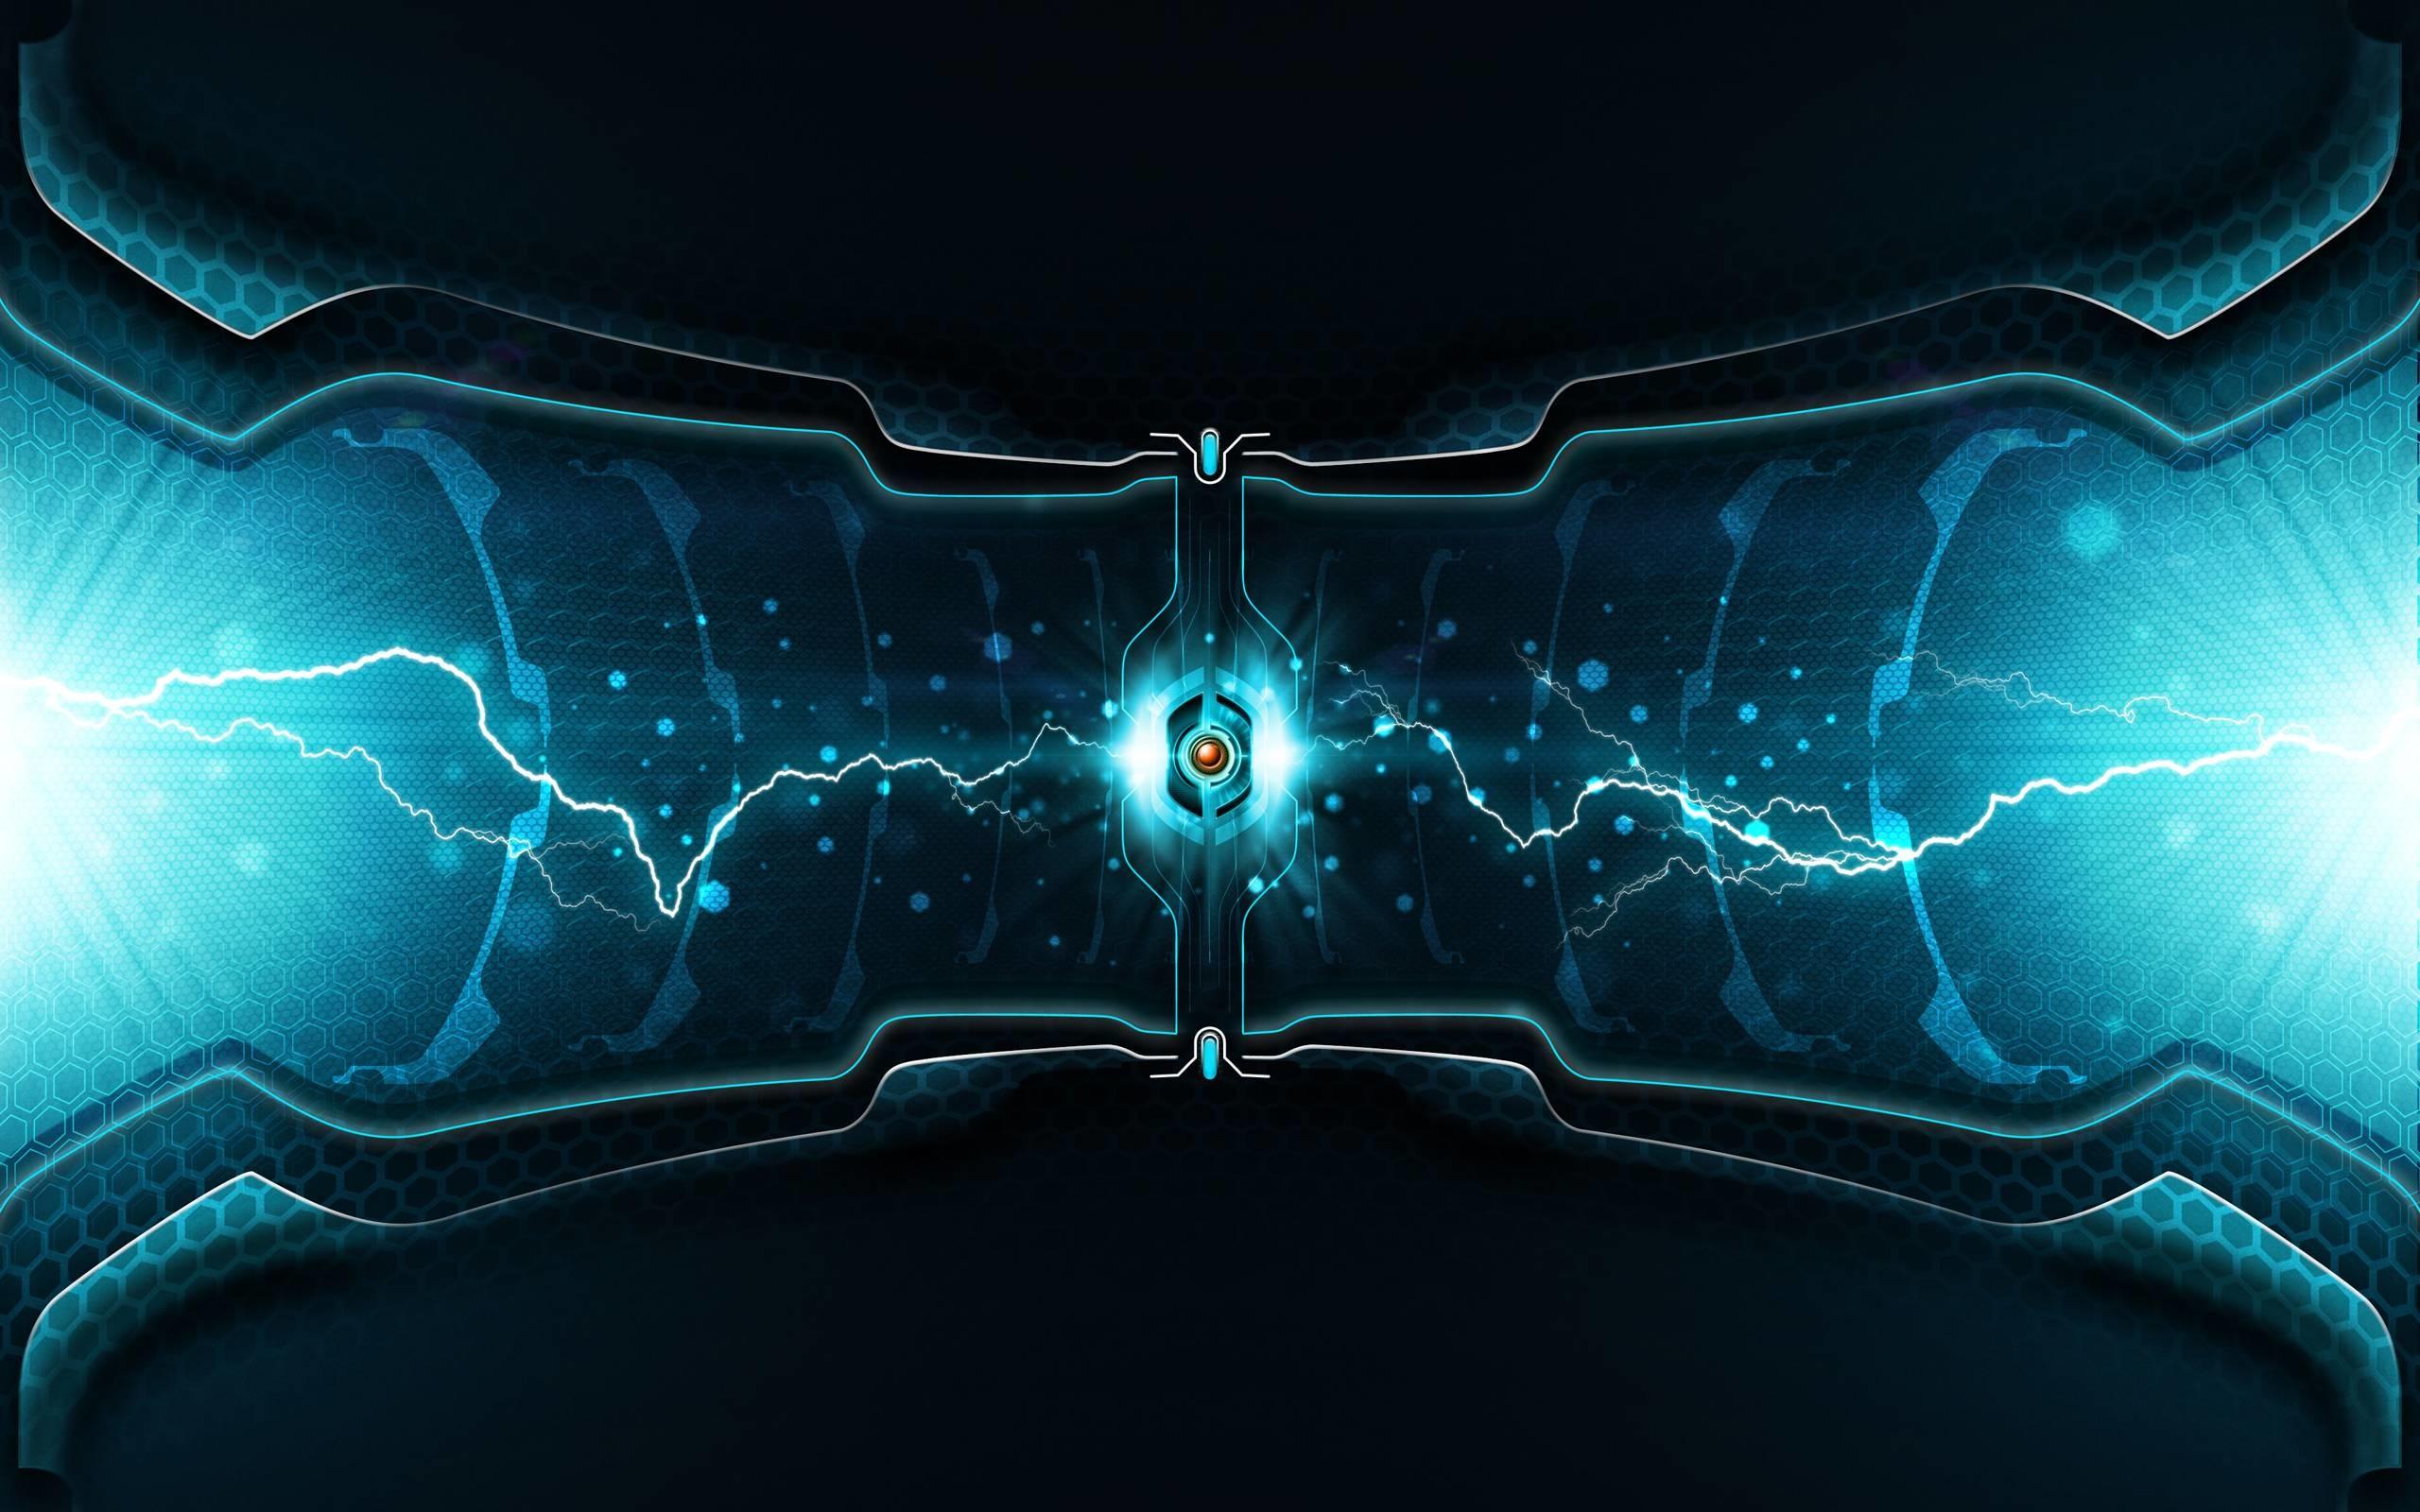 Blue Lightning Wallpaper, PC 43 Blue Lightning Pics, NM.CP